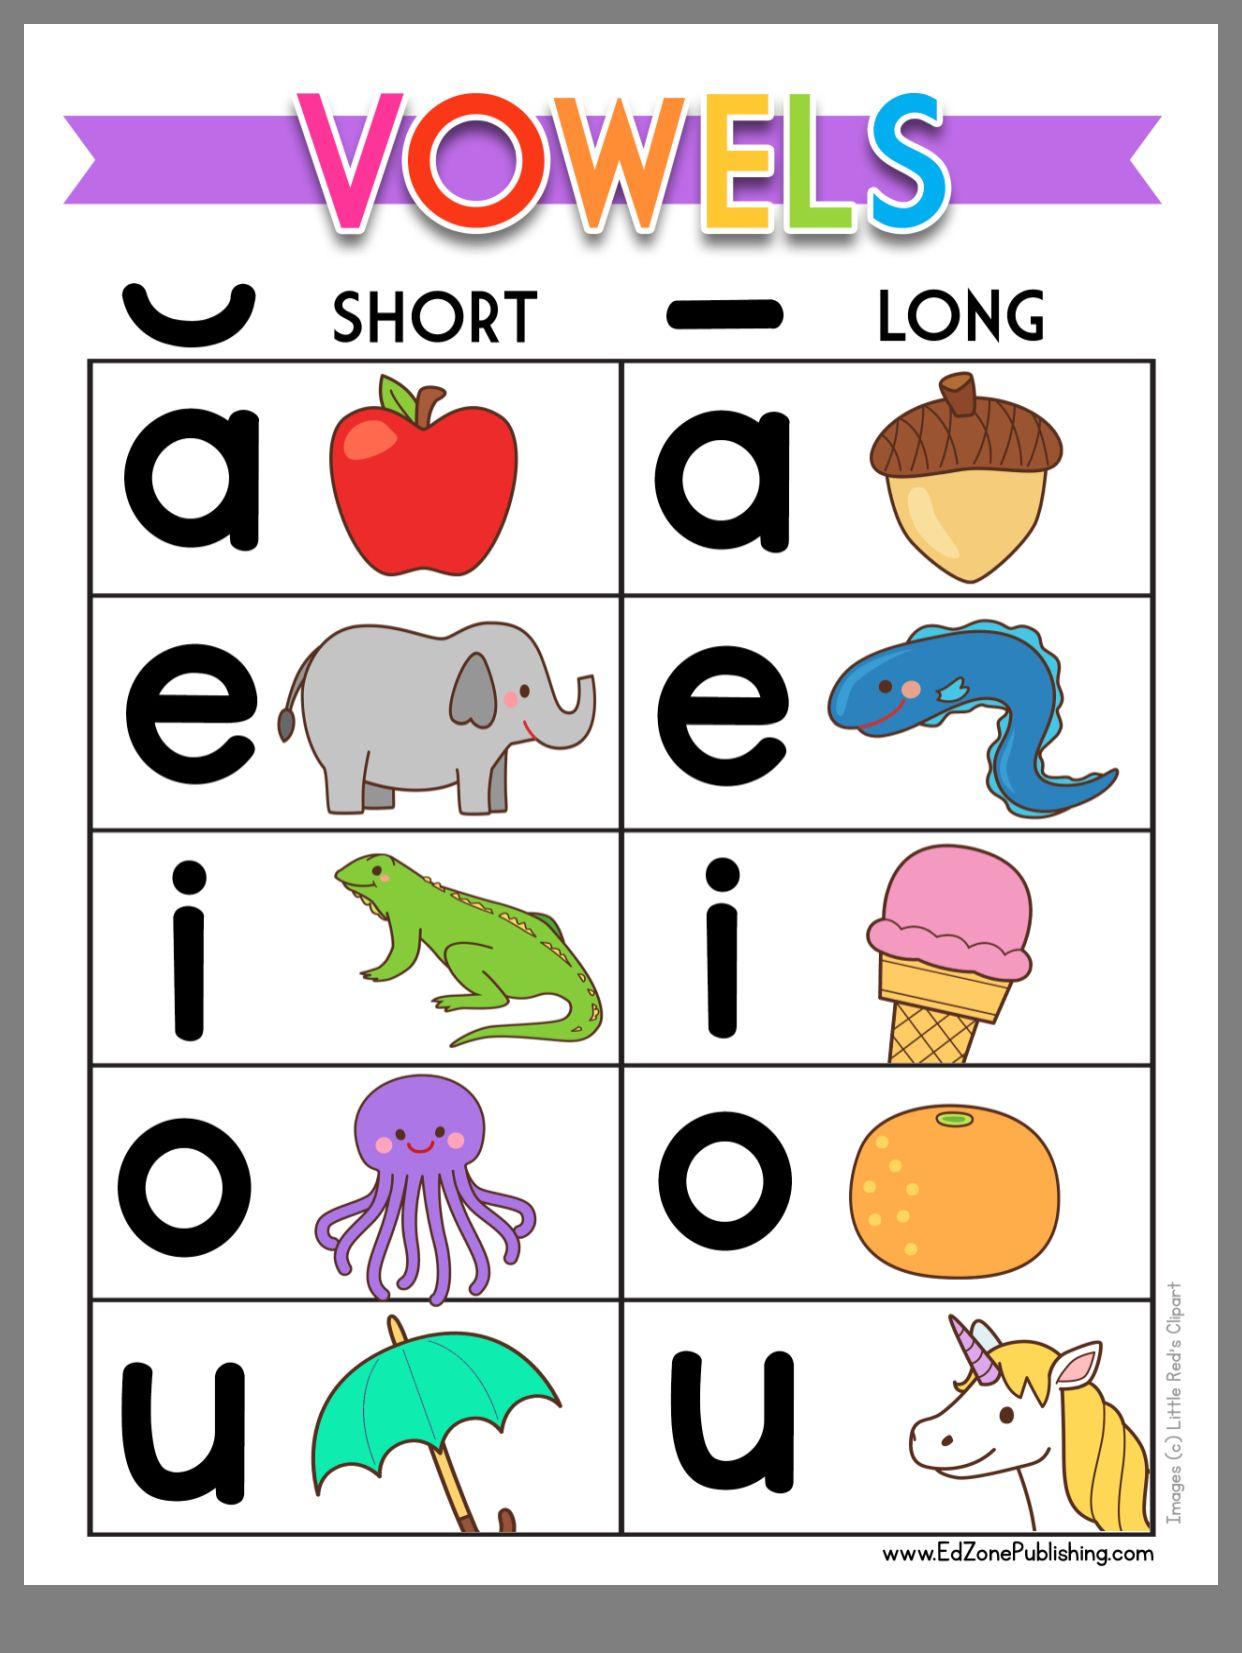 Pin By Rebecca Rodgers On Preschool Vowel Worksheets Vowel Chart Short Vowel Worksheets [ 1653 x 1242 Pixel ]